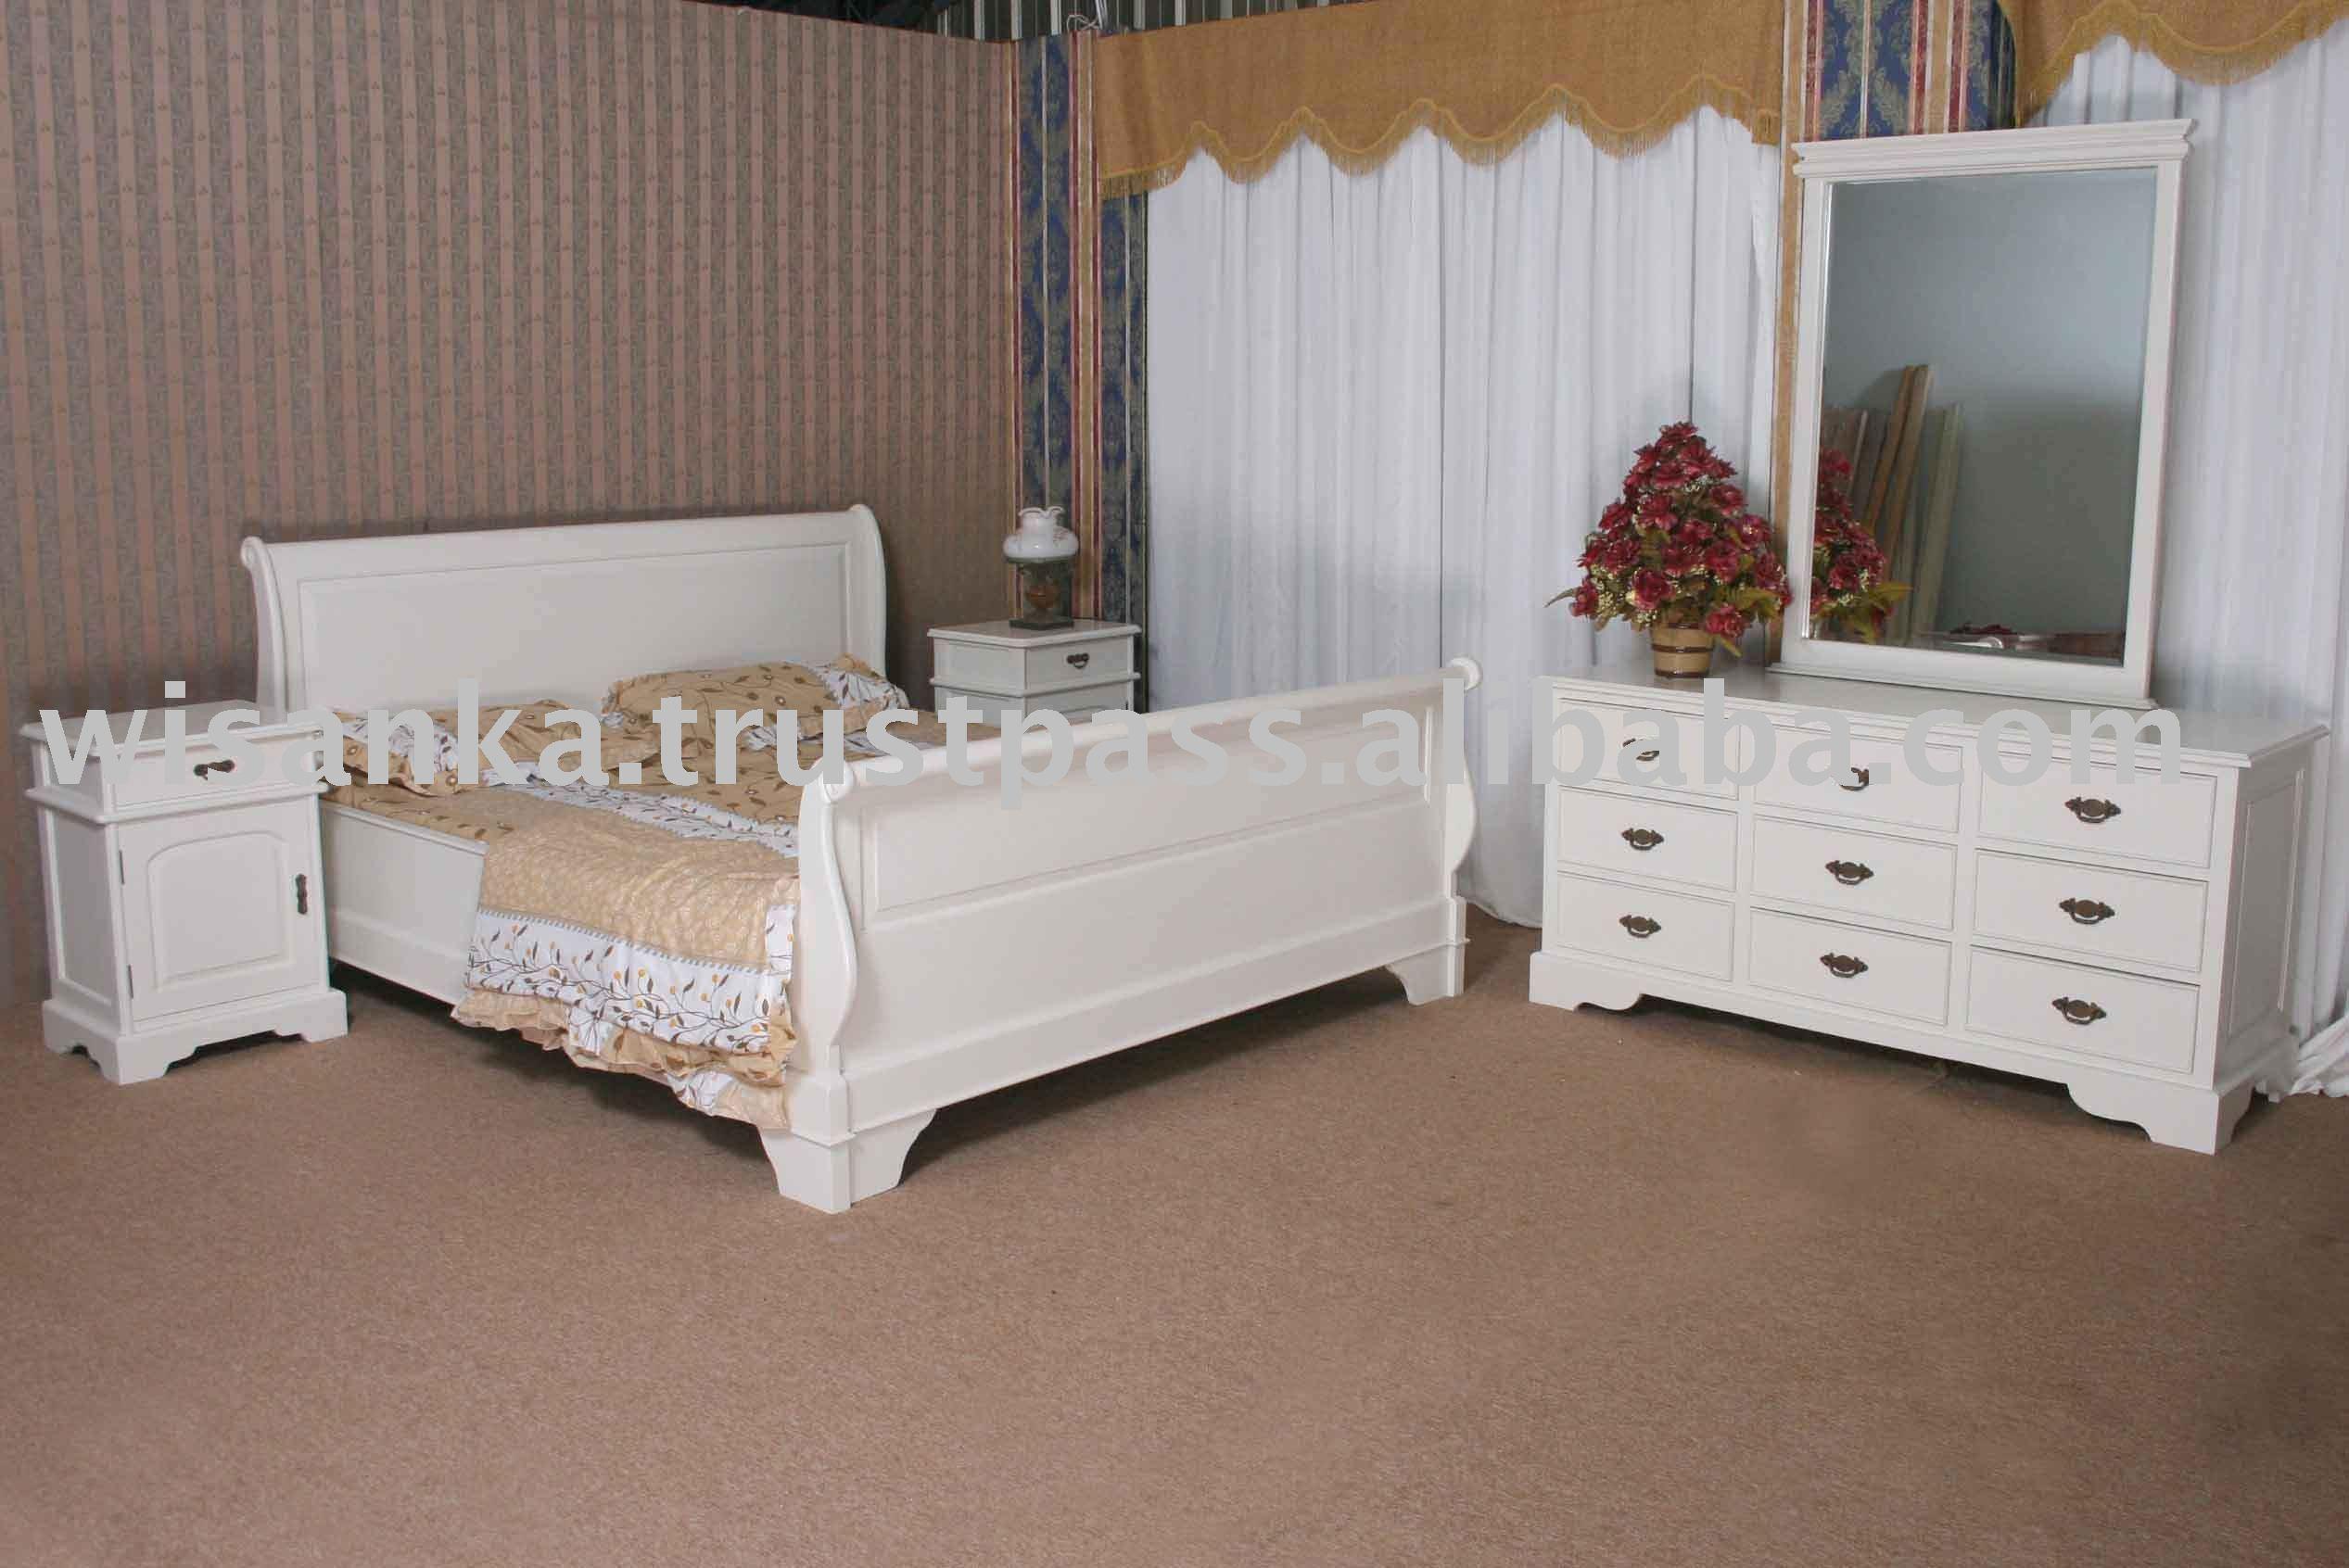 Savitri Bedroom Set (off White) - Buy Classic Bedroom,Classic  Furniture,Bedroom Set Product on Alibaba.com